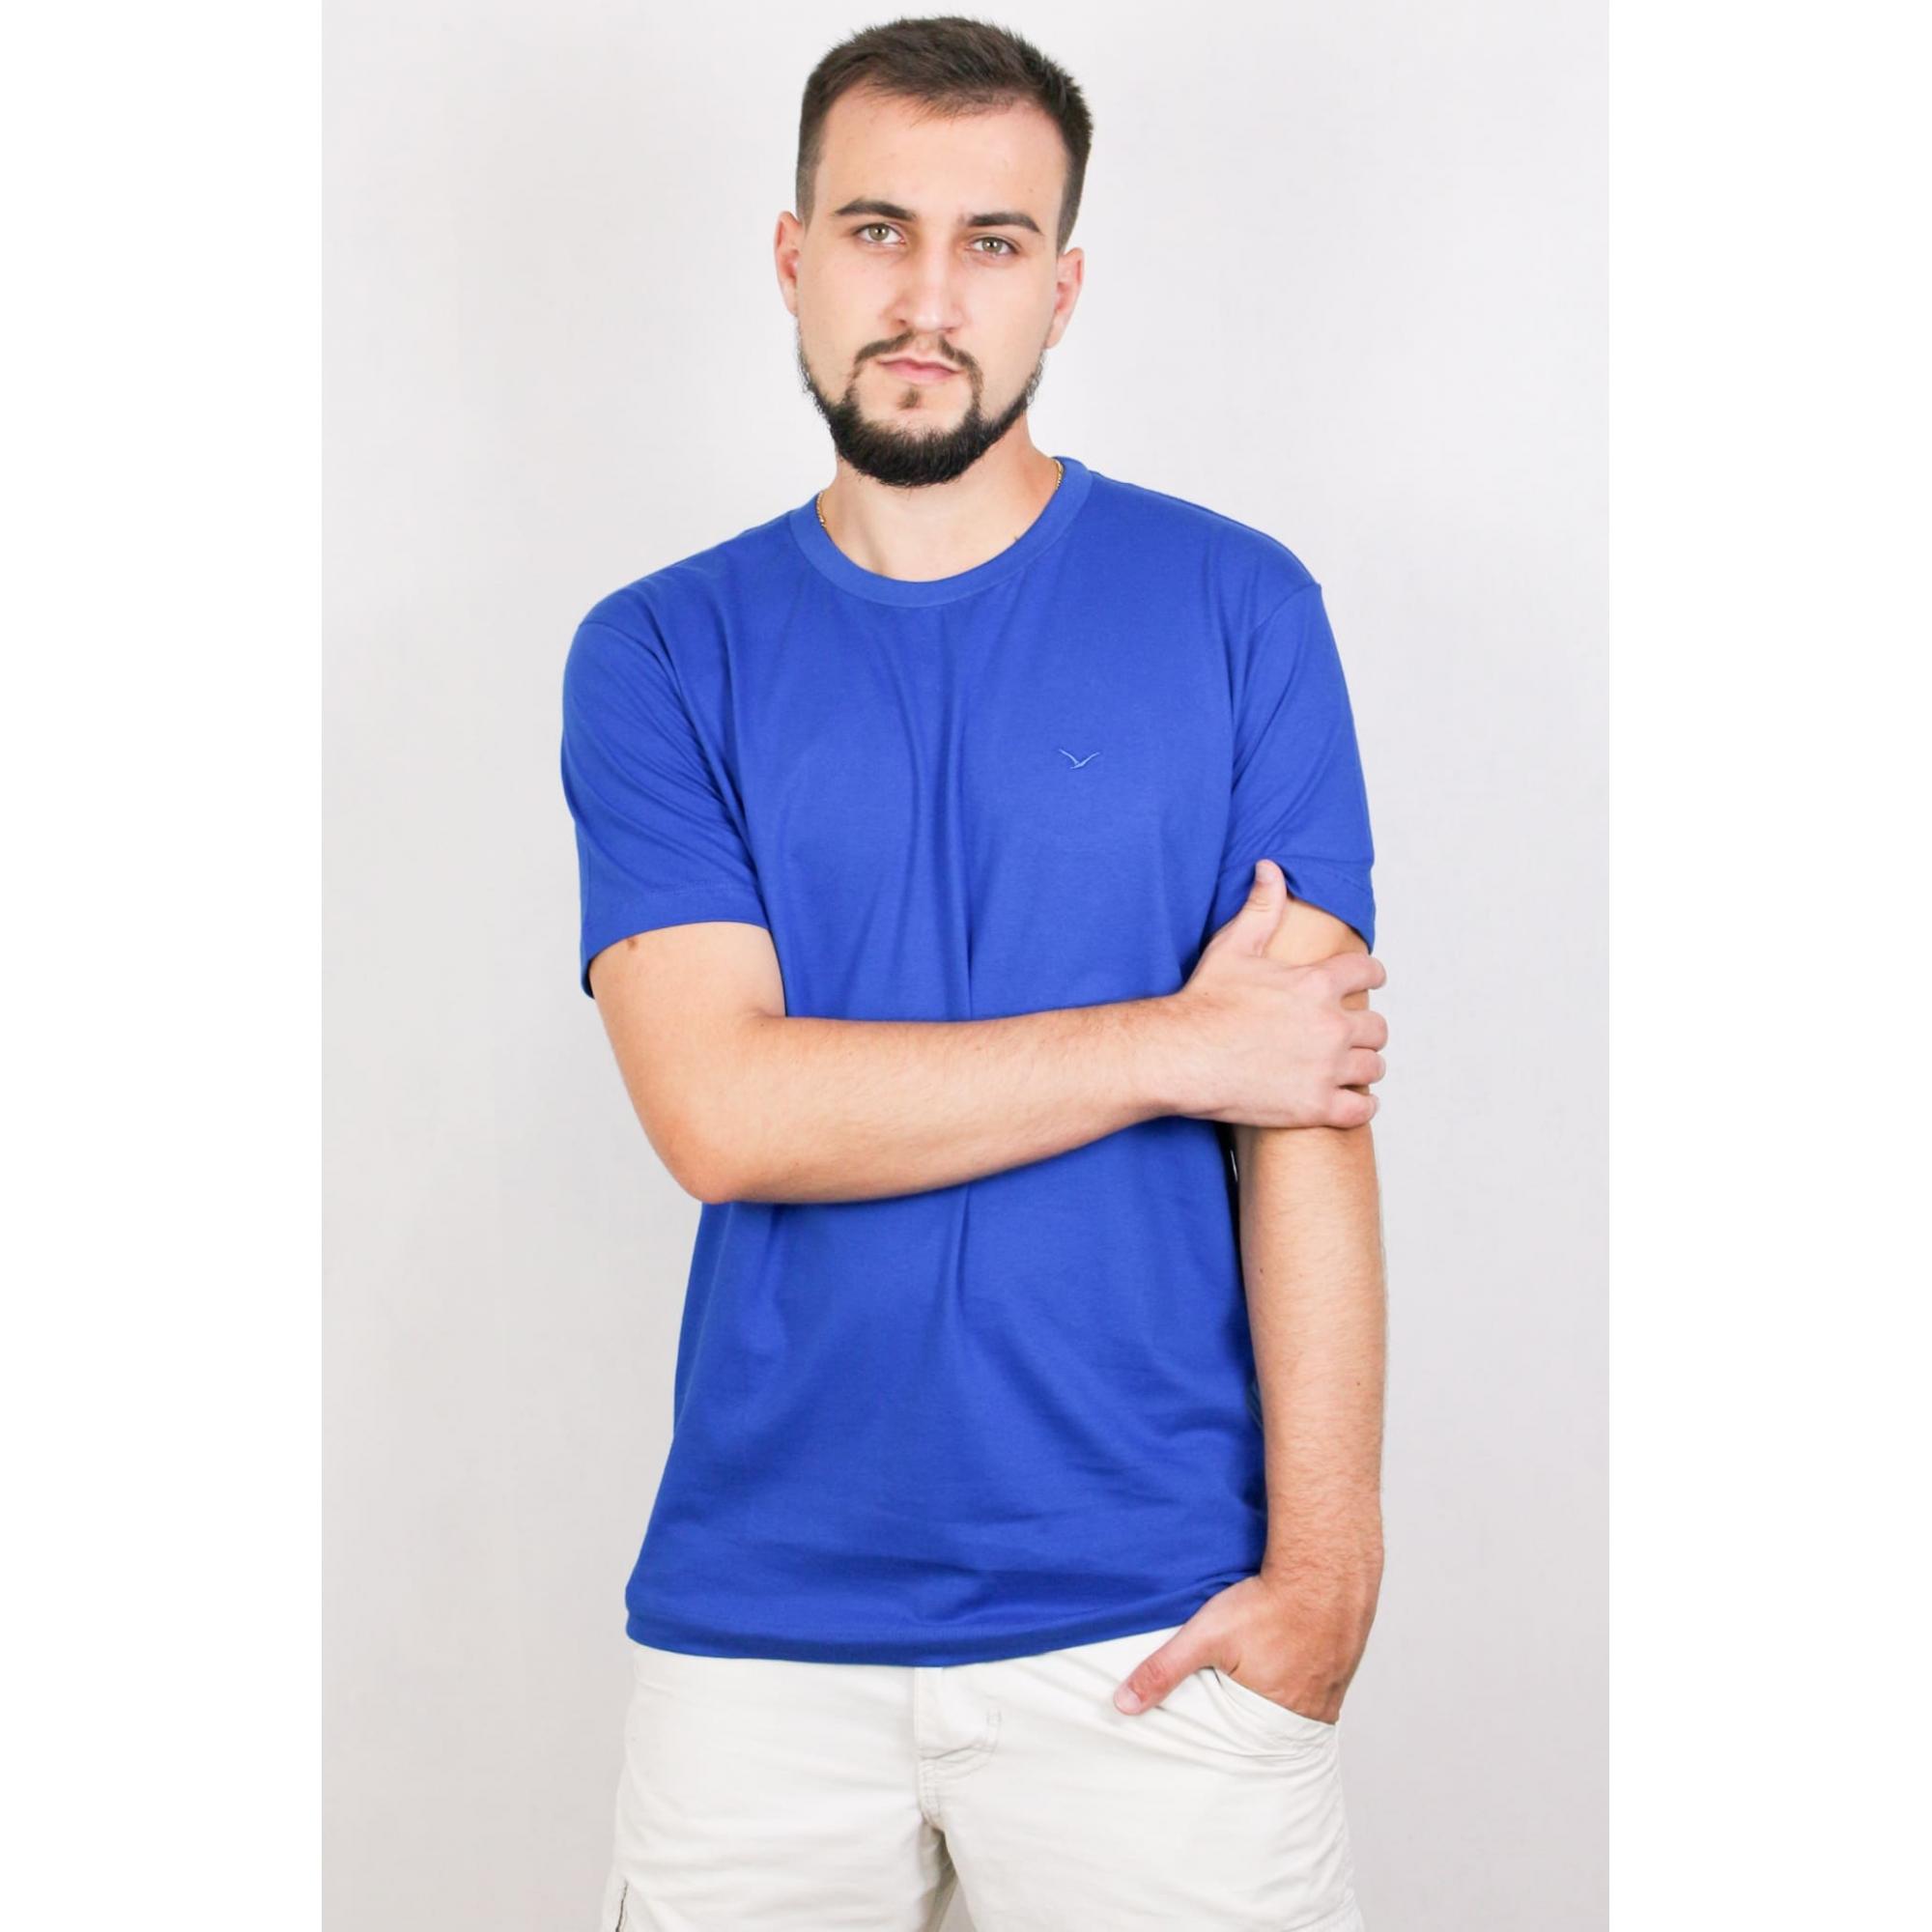 Camisa Masculina Manga Curta Básica